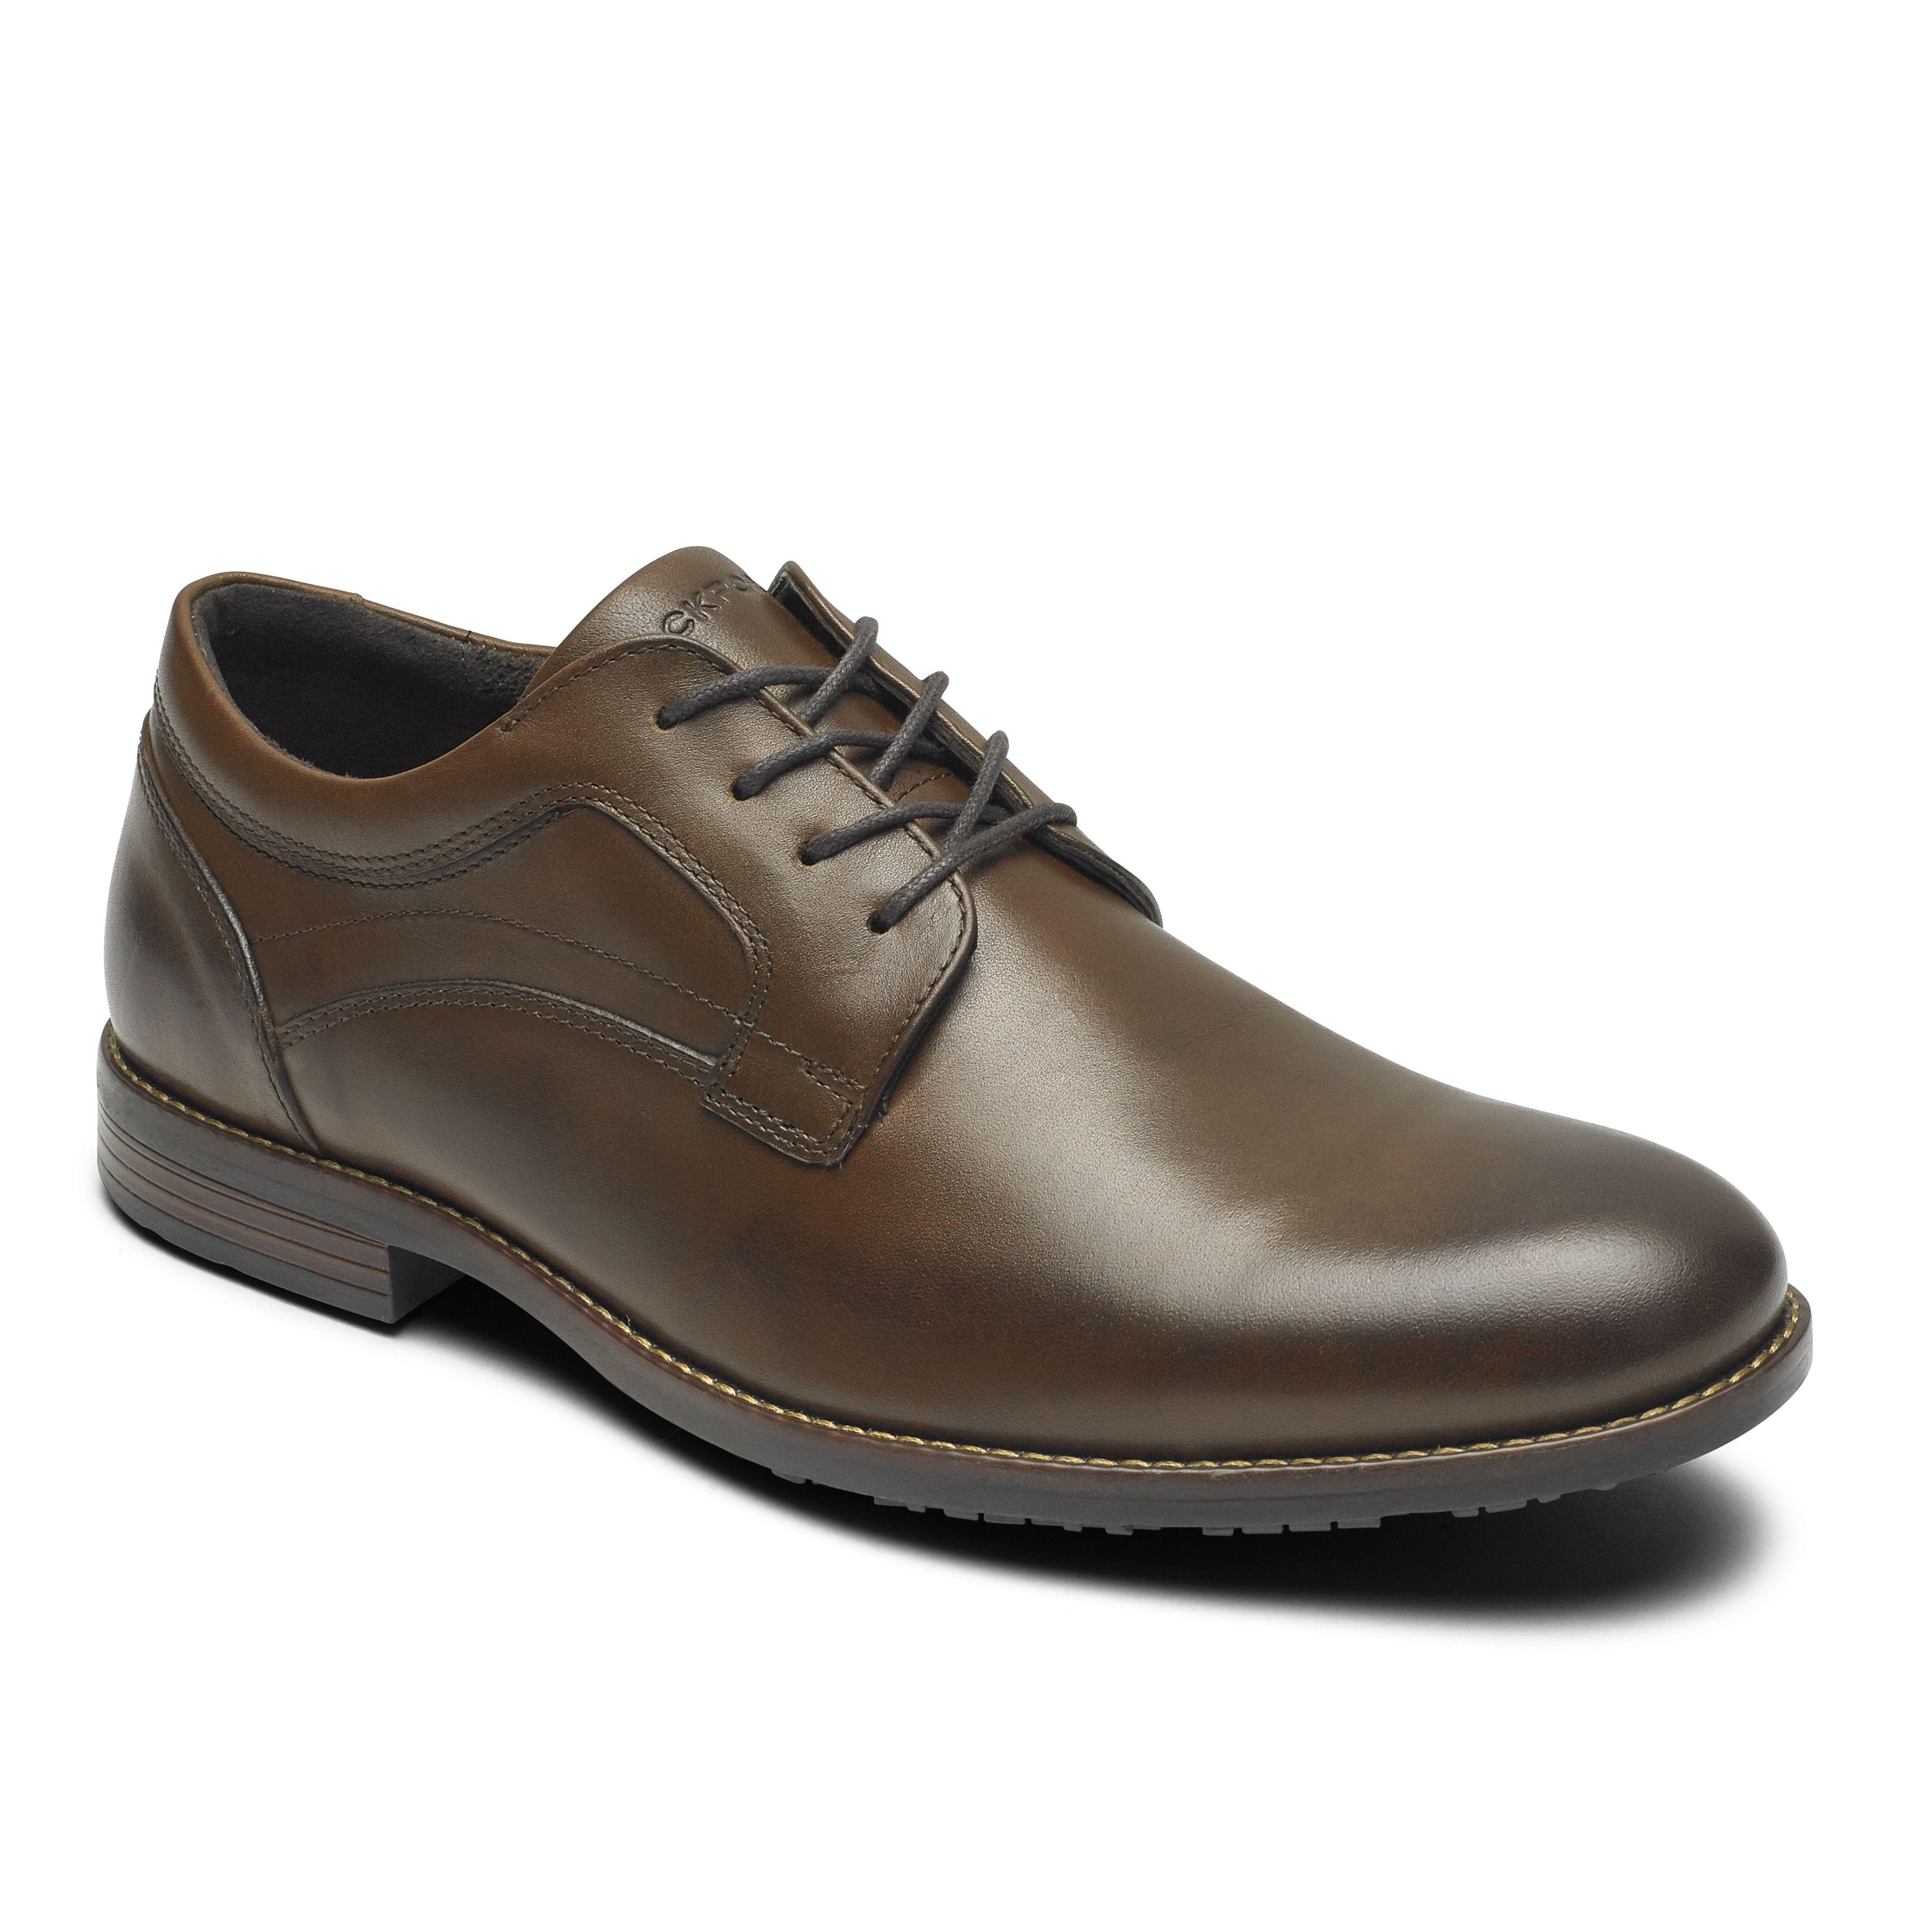 ROCKPORT 男 防潑水系列 業務最愛真皮紳士鞋-咖啡色ROM2293SD19